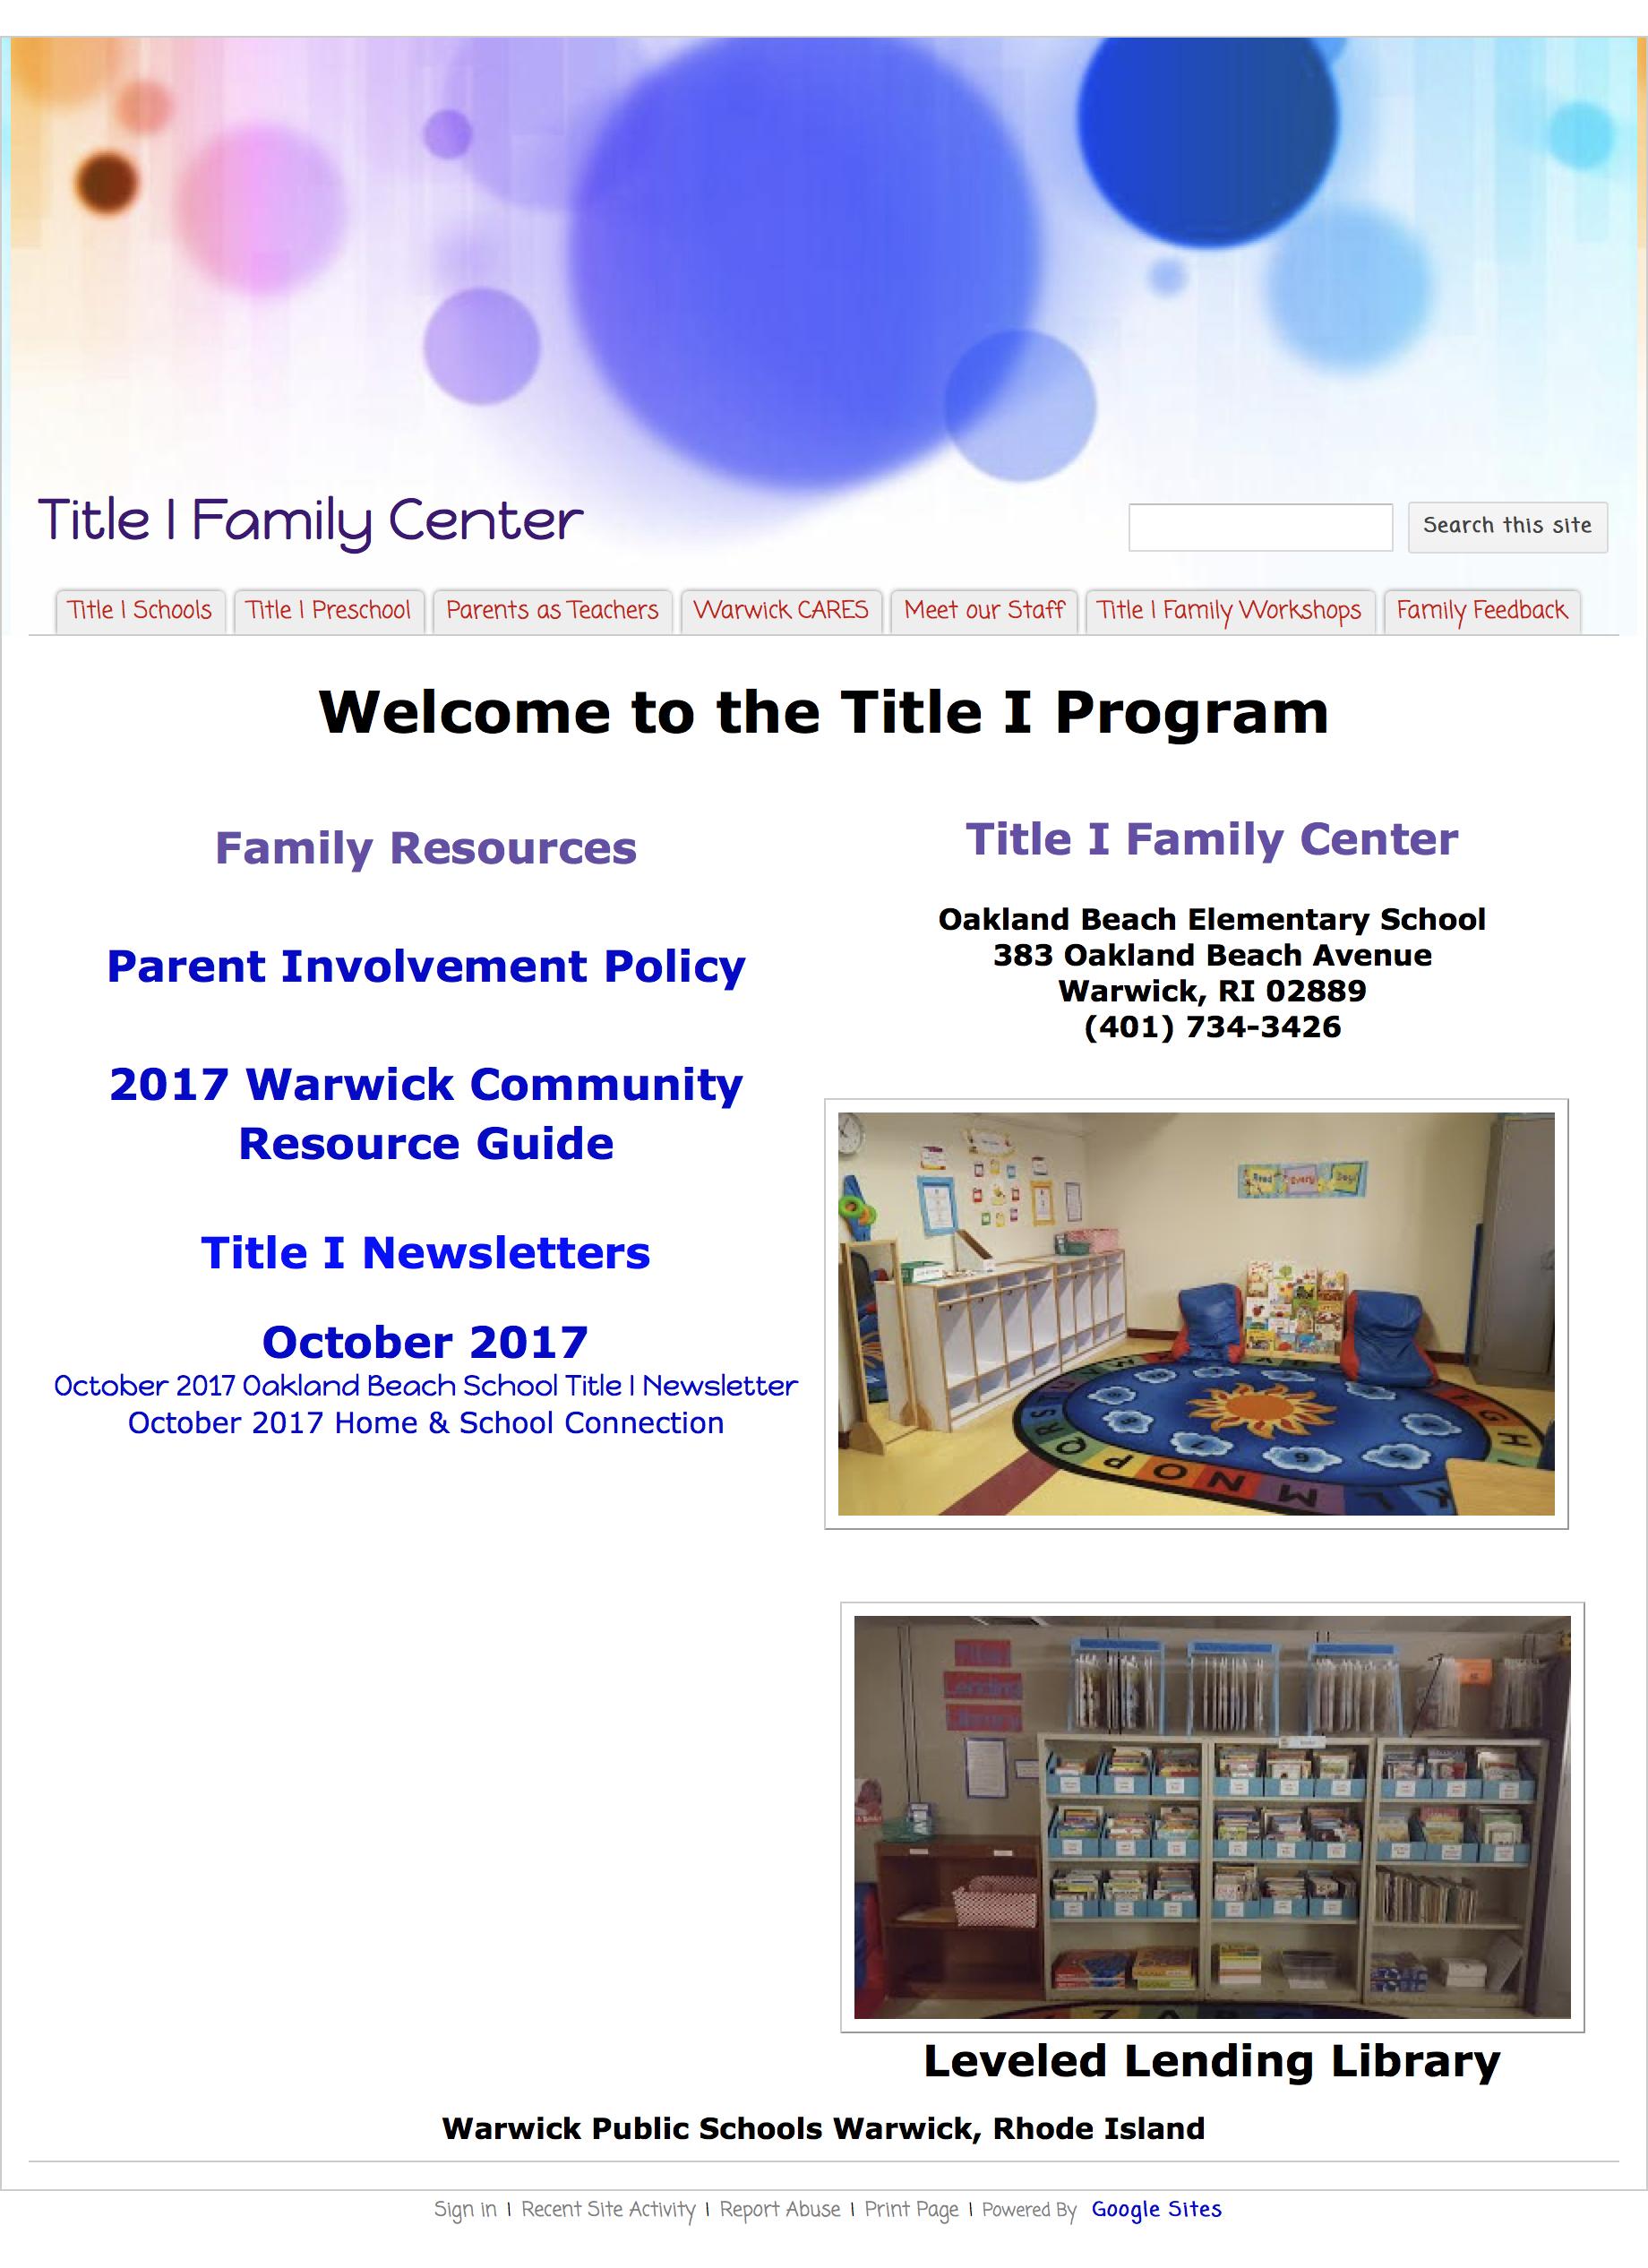 Title I Family Center | Warwick Public Schools